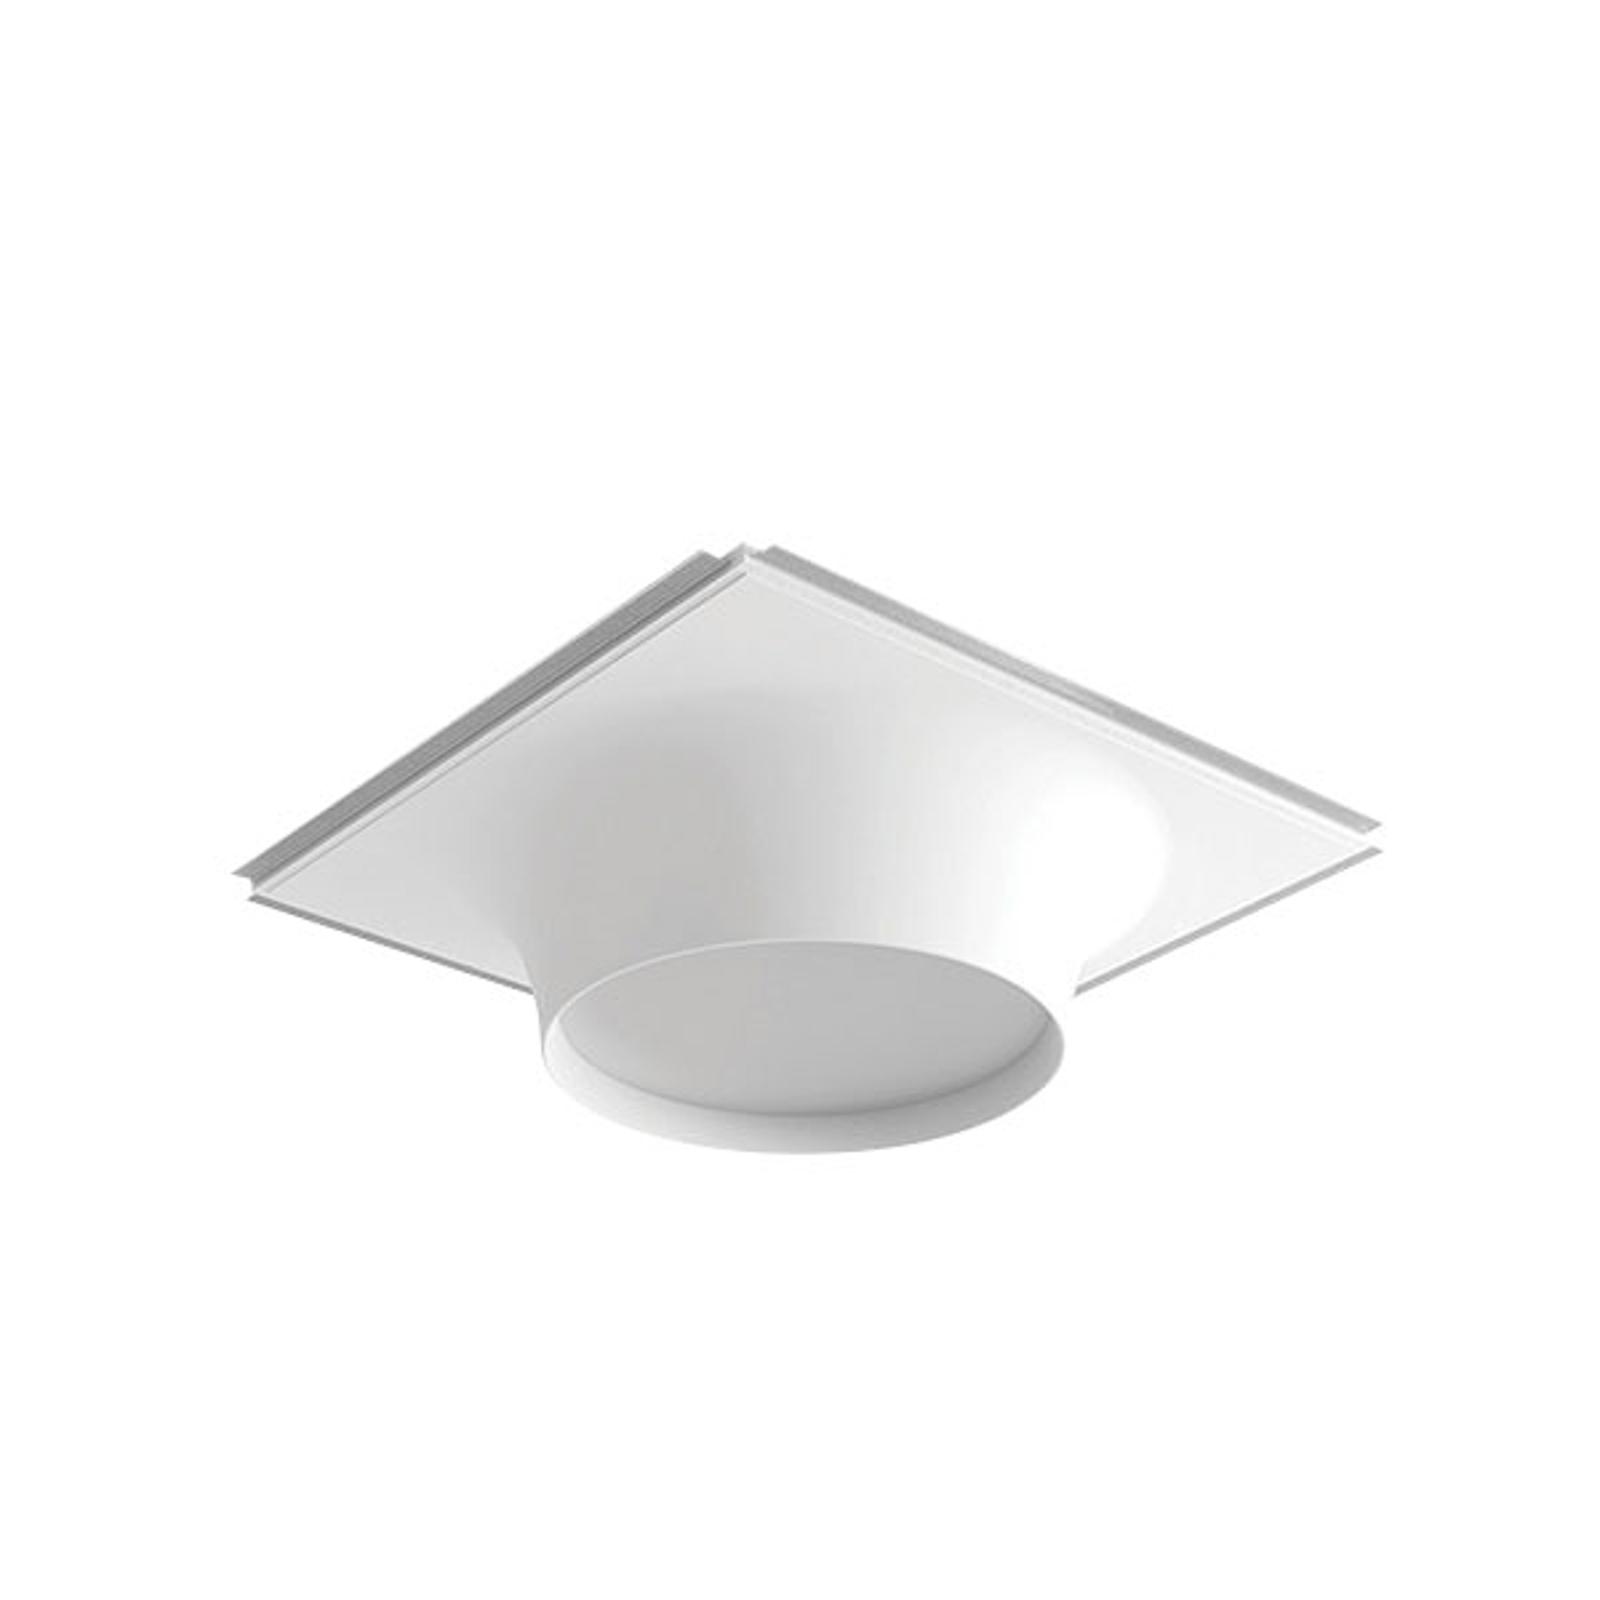 LED-Deckeneinbaulampe 8935B, 2.700K, 68x68cm